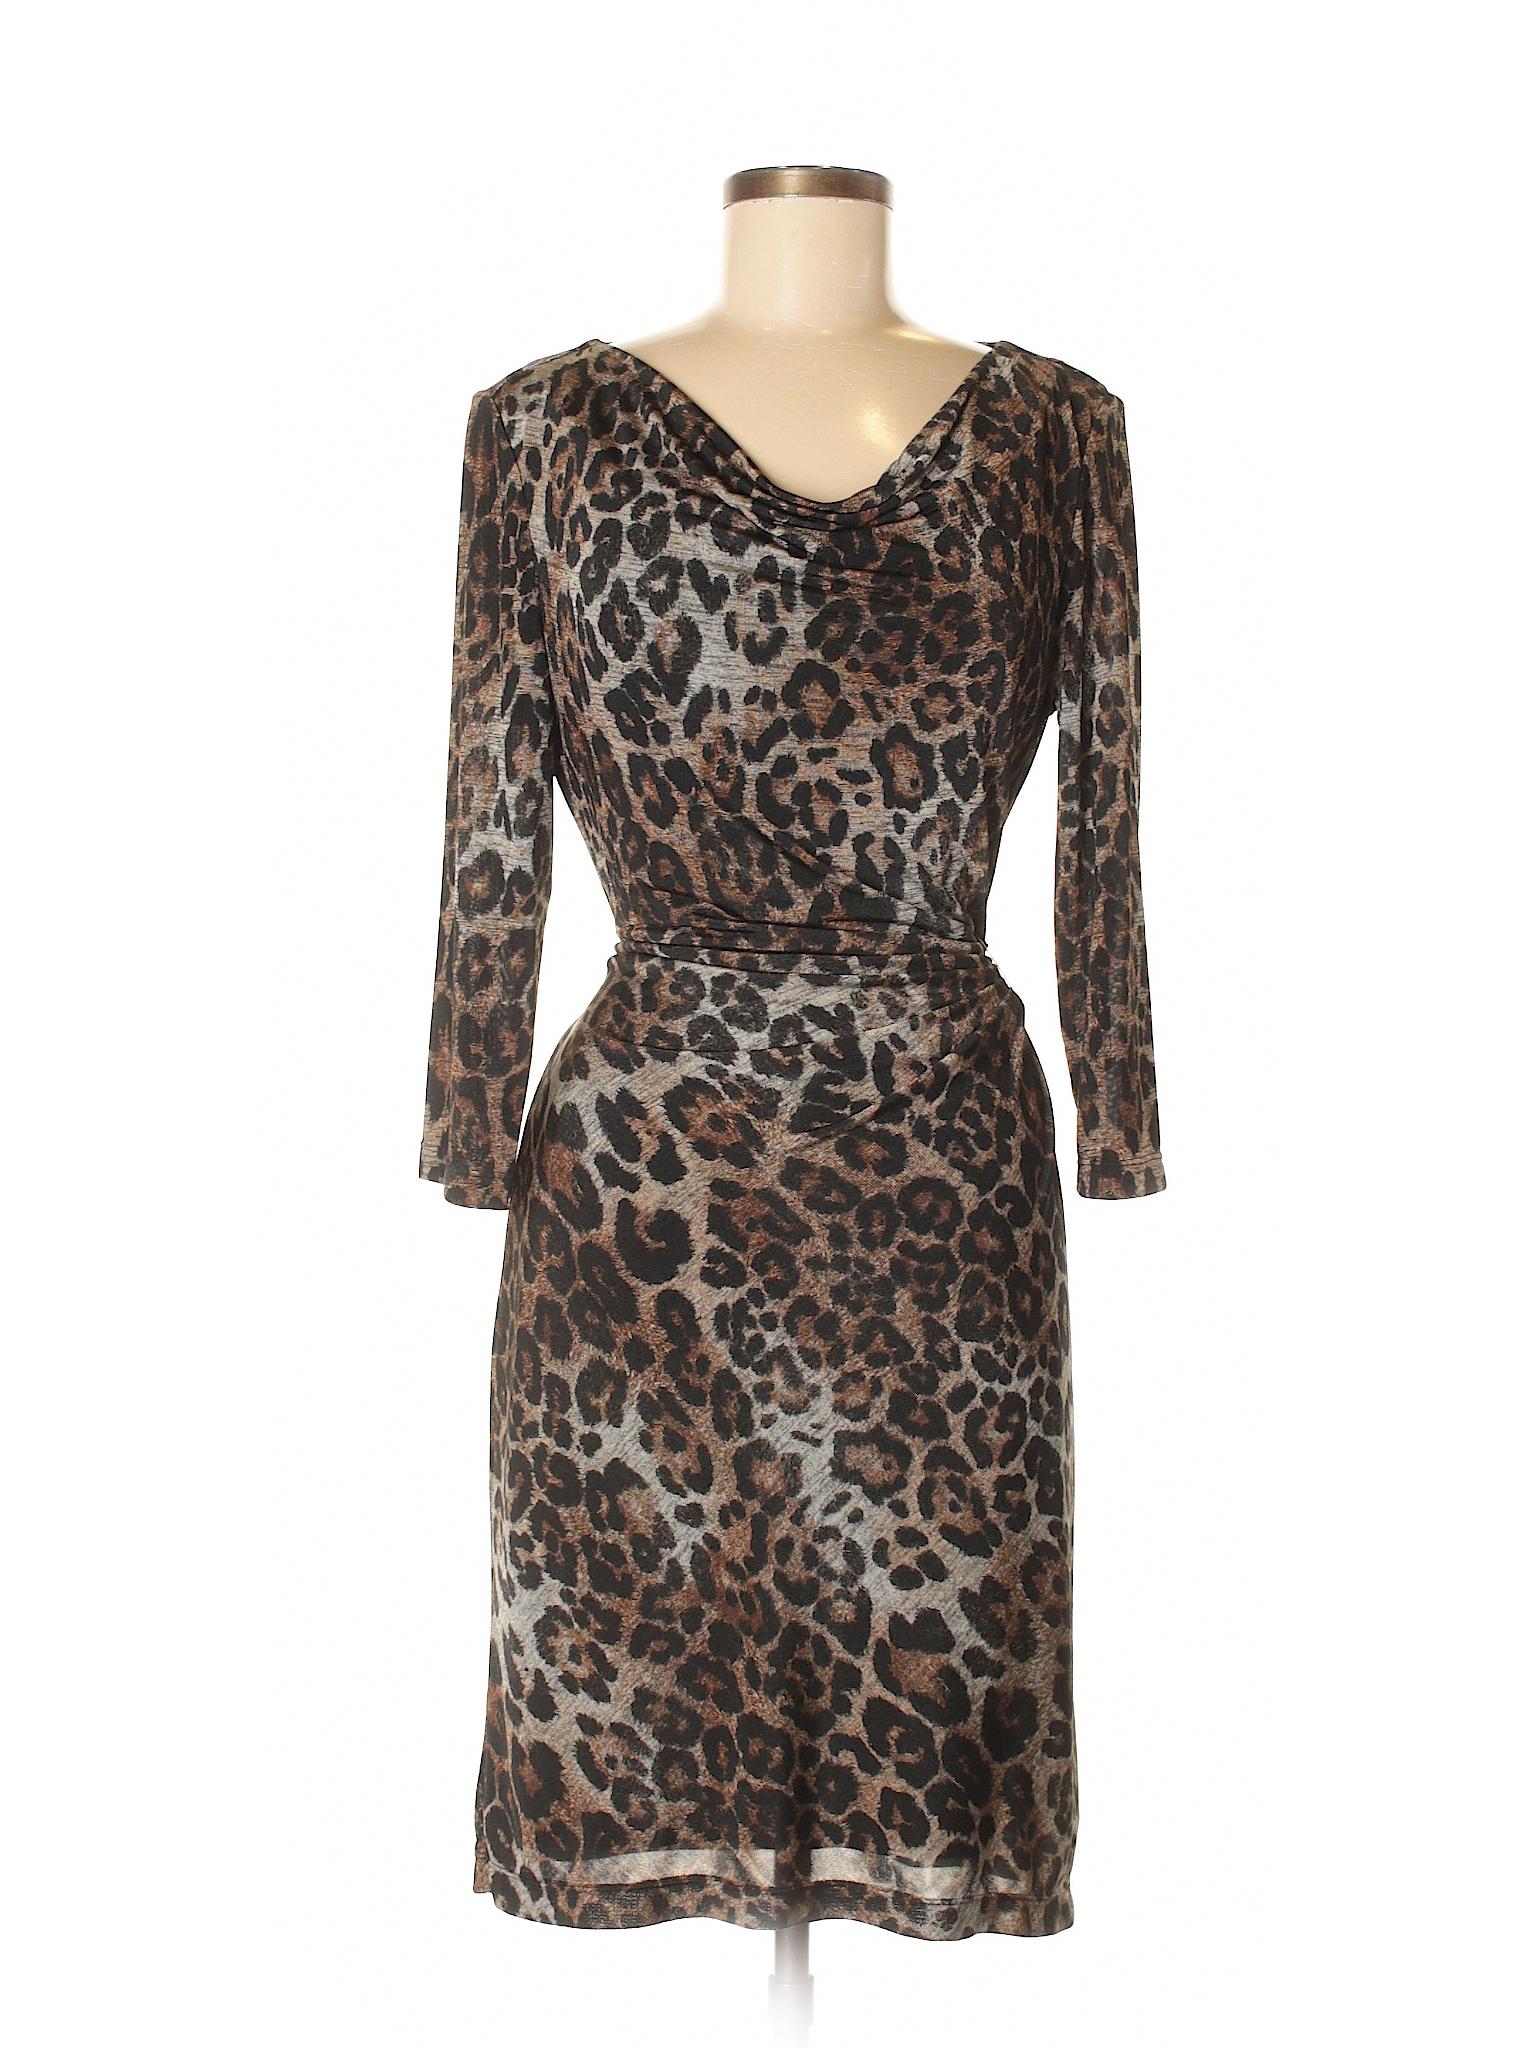 by ASL Casual winter Dress Tahari Boutique zEwAq4Sx